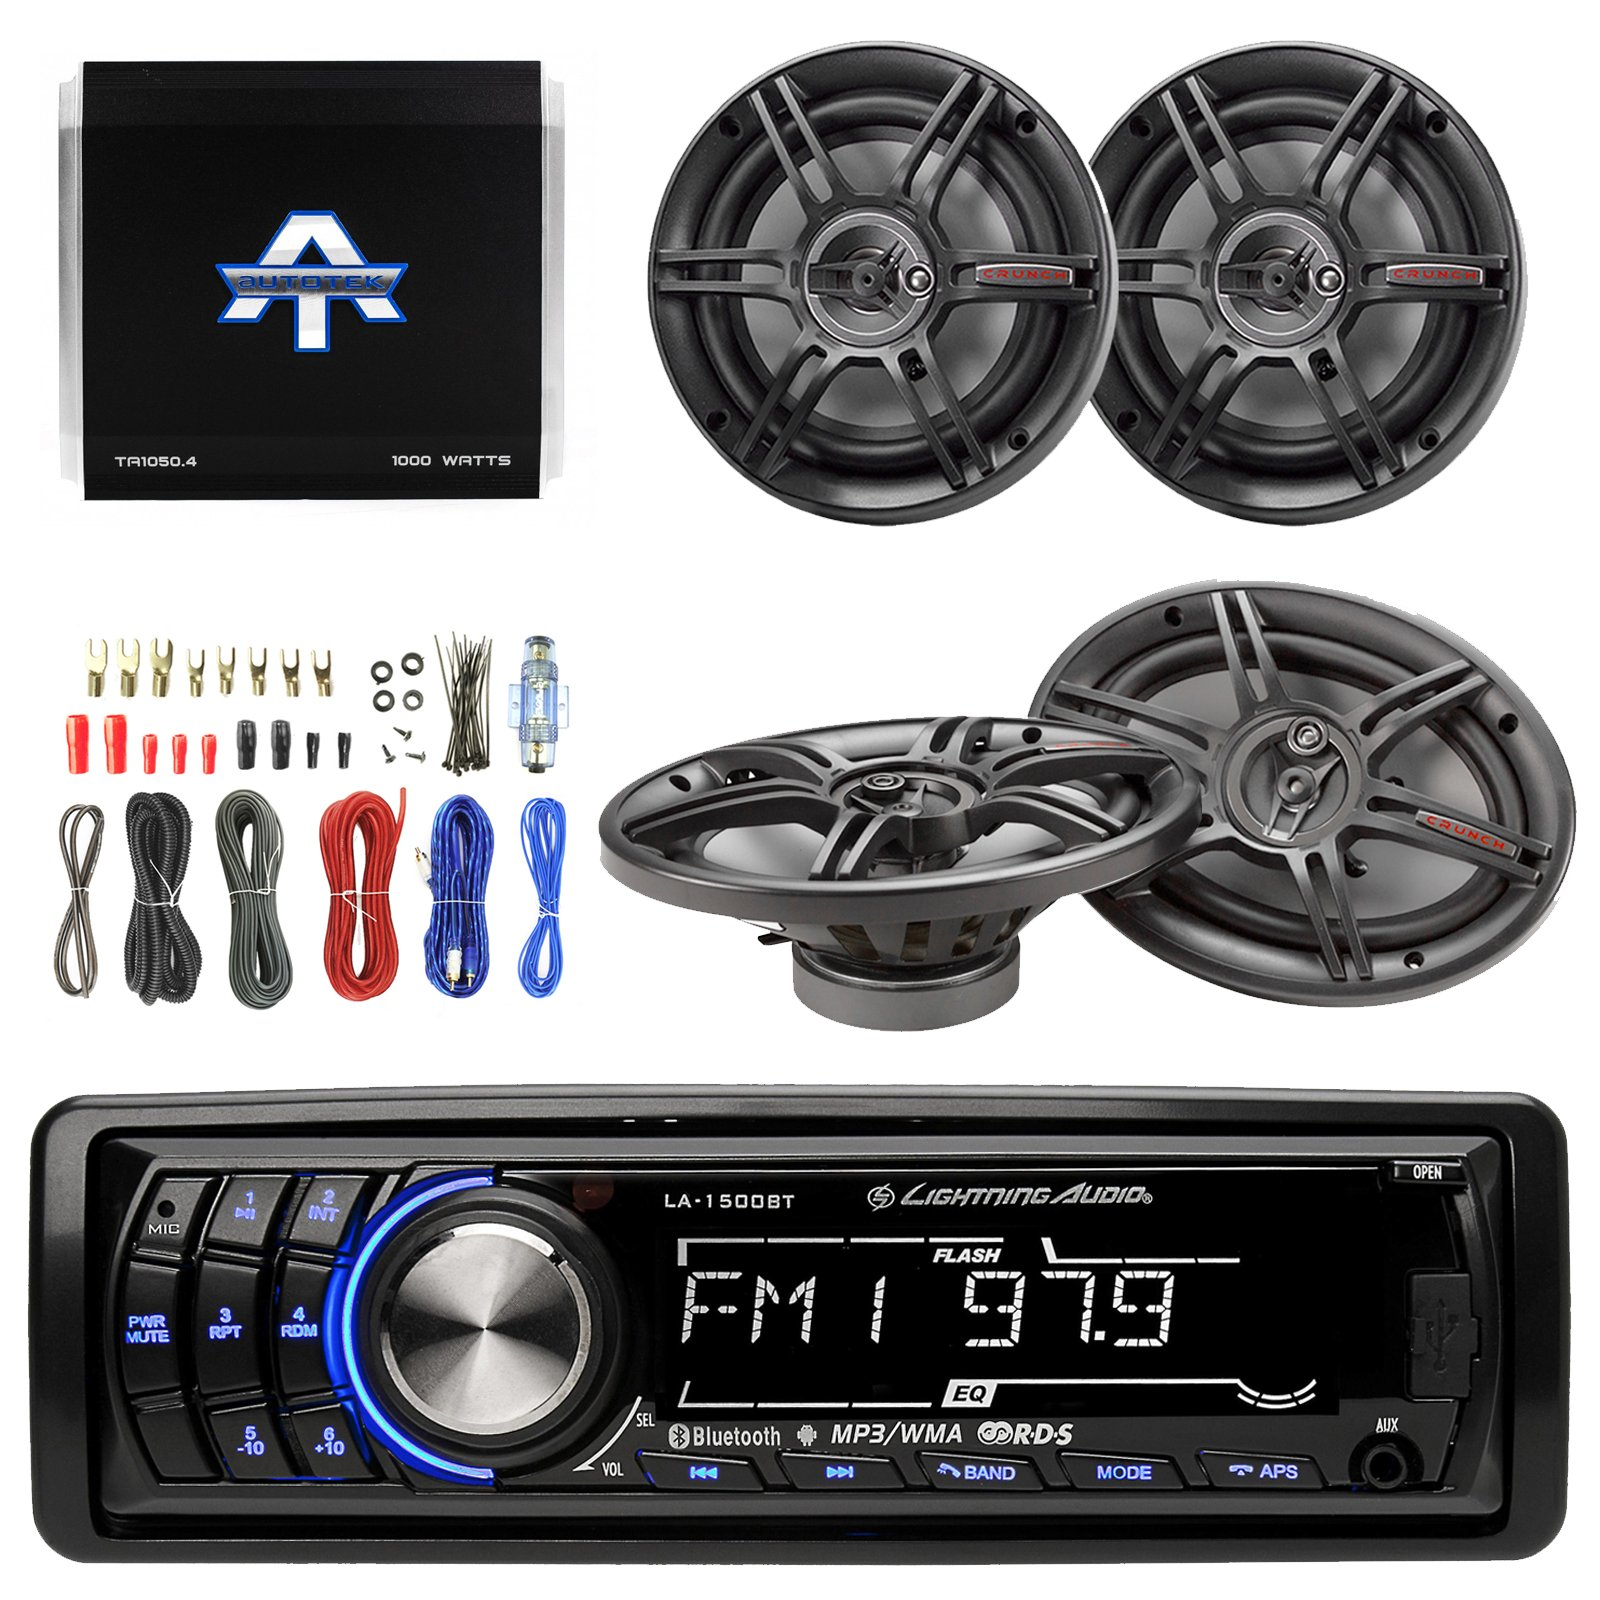 Lightning Audio By Rockford Fosgate LA1500BT MP3 Bluetooth Stereo Receiver Bundle Combo With 2x Crunch 6.5'' Inch & 2x 6x9'' 3-Way Black Coaxial Speaker + Autotek TA10504 Amp + Enrock Amp Install Kit